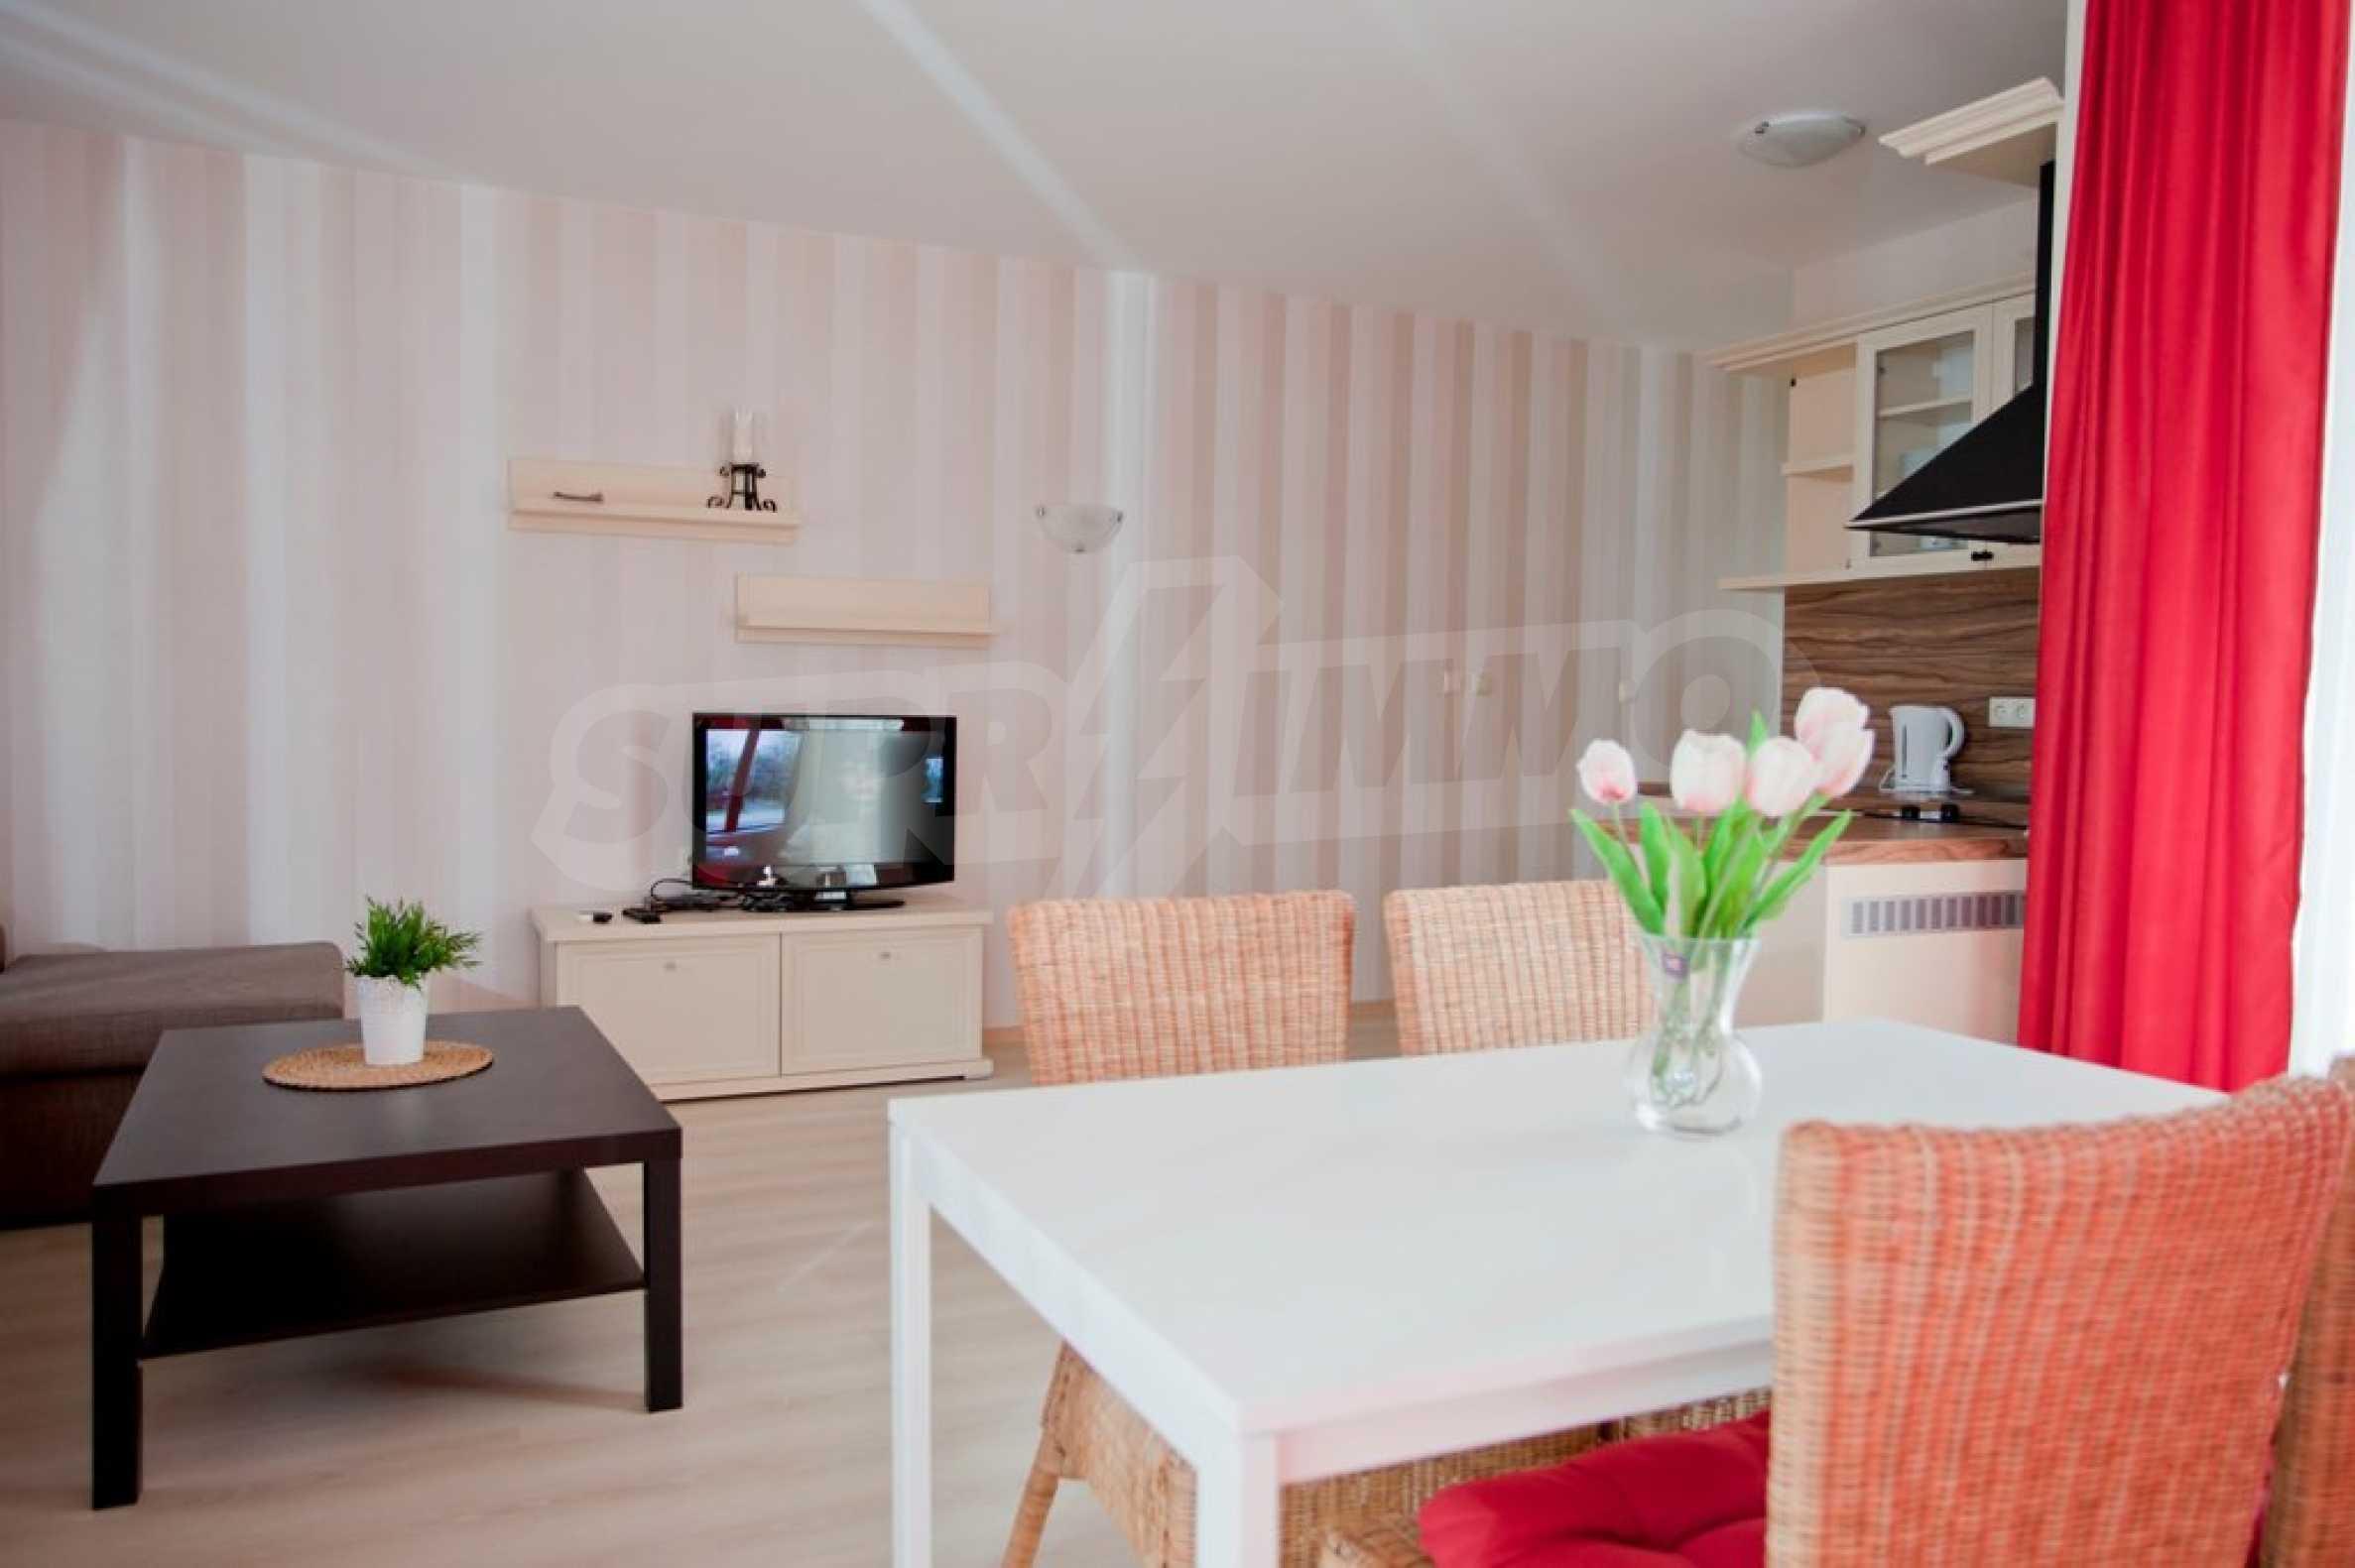 New apartment complex Atia resort in Chernomorets 22